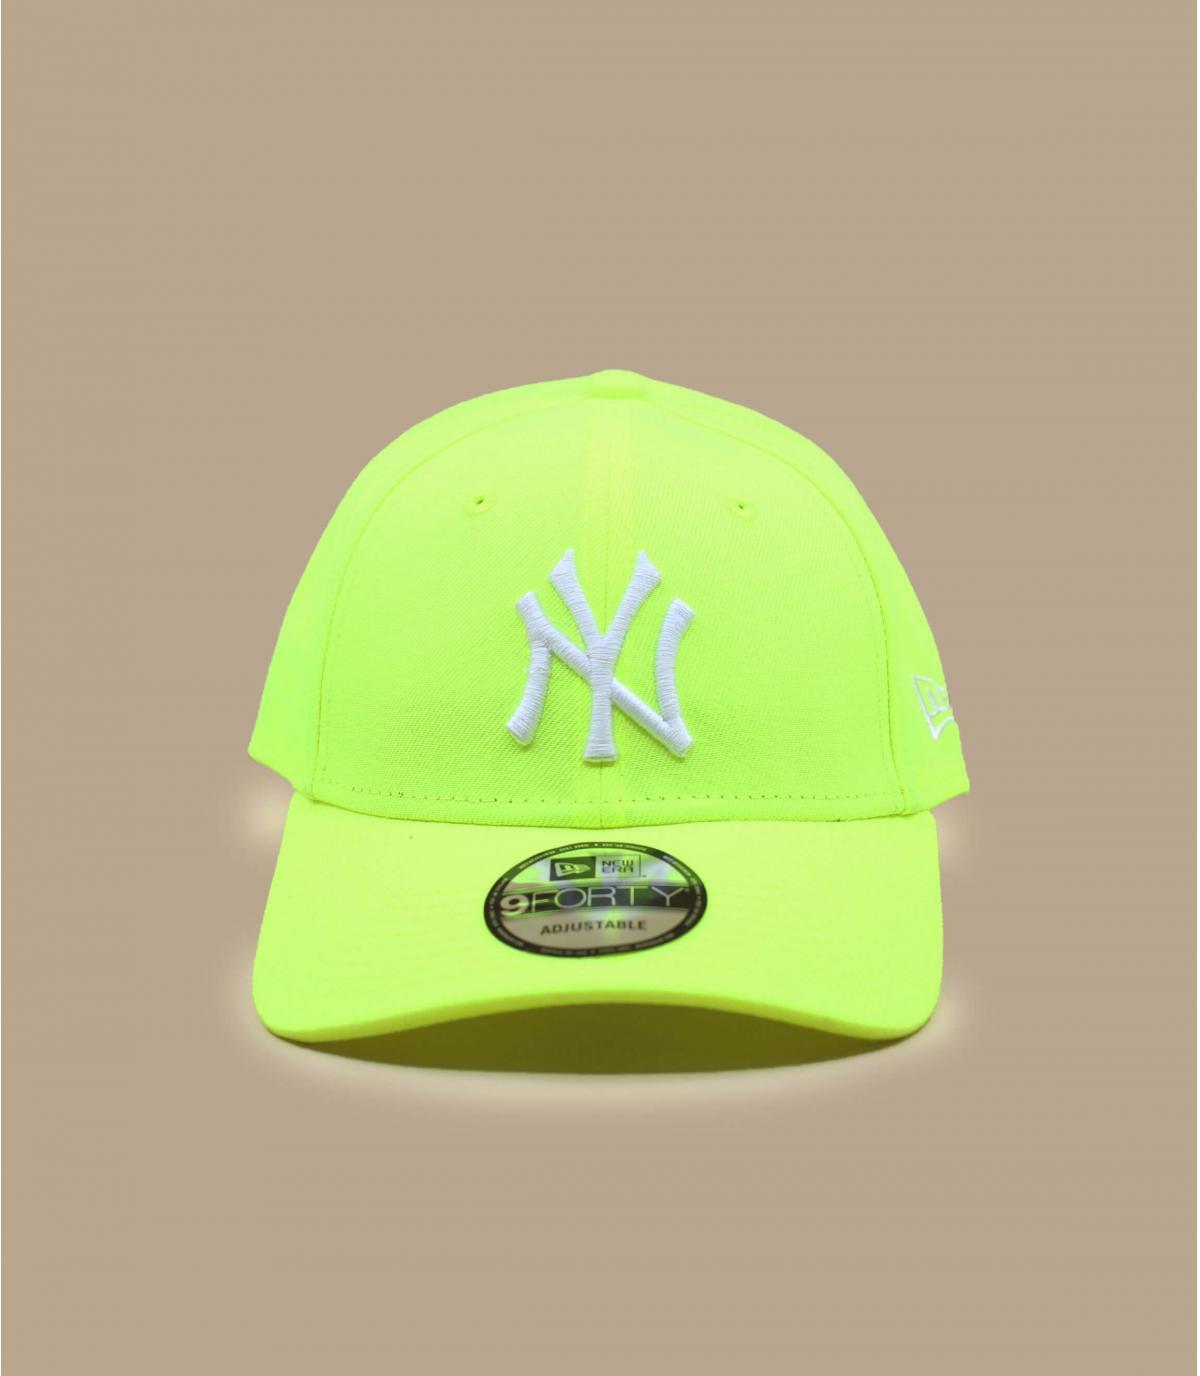 Details Cap NY 9forty neon yellow white - Abbildung 2